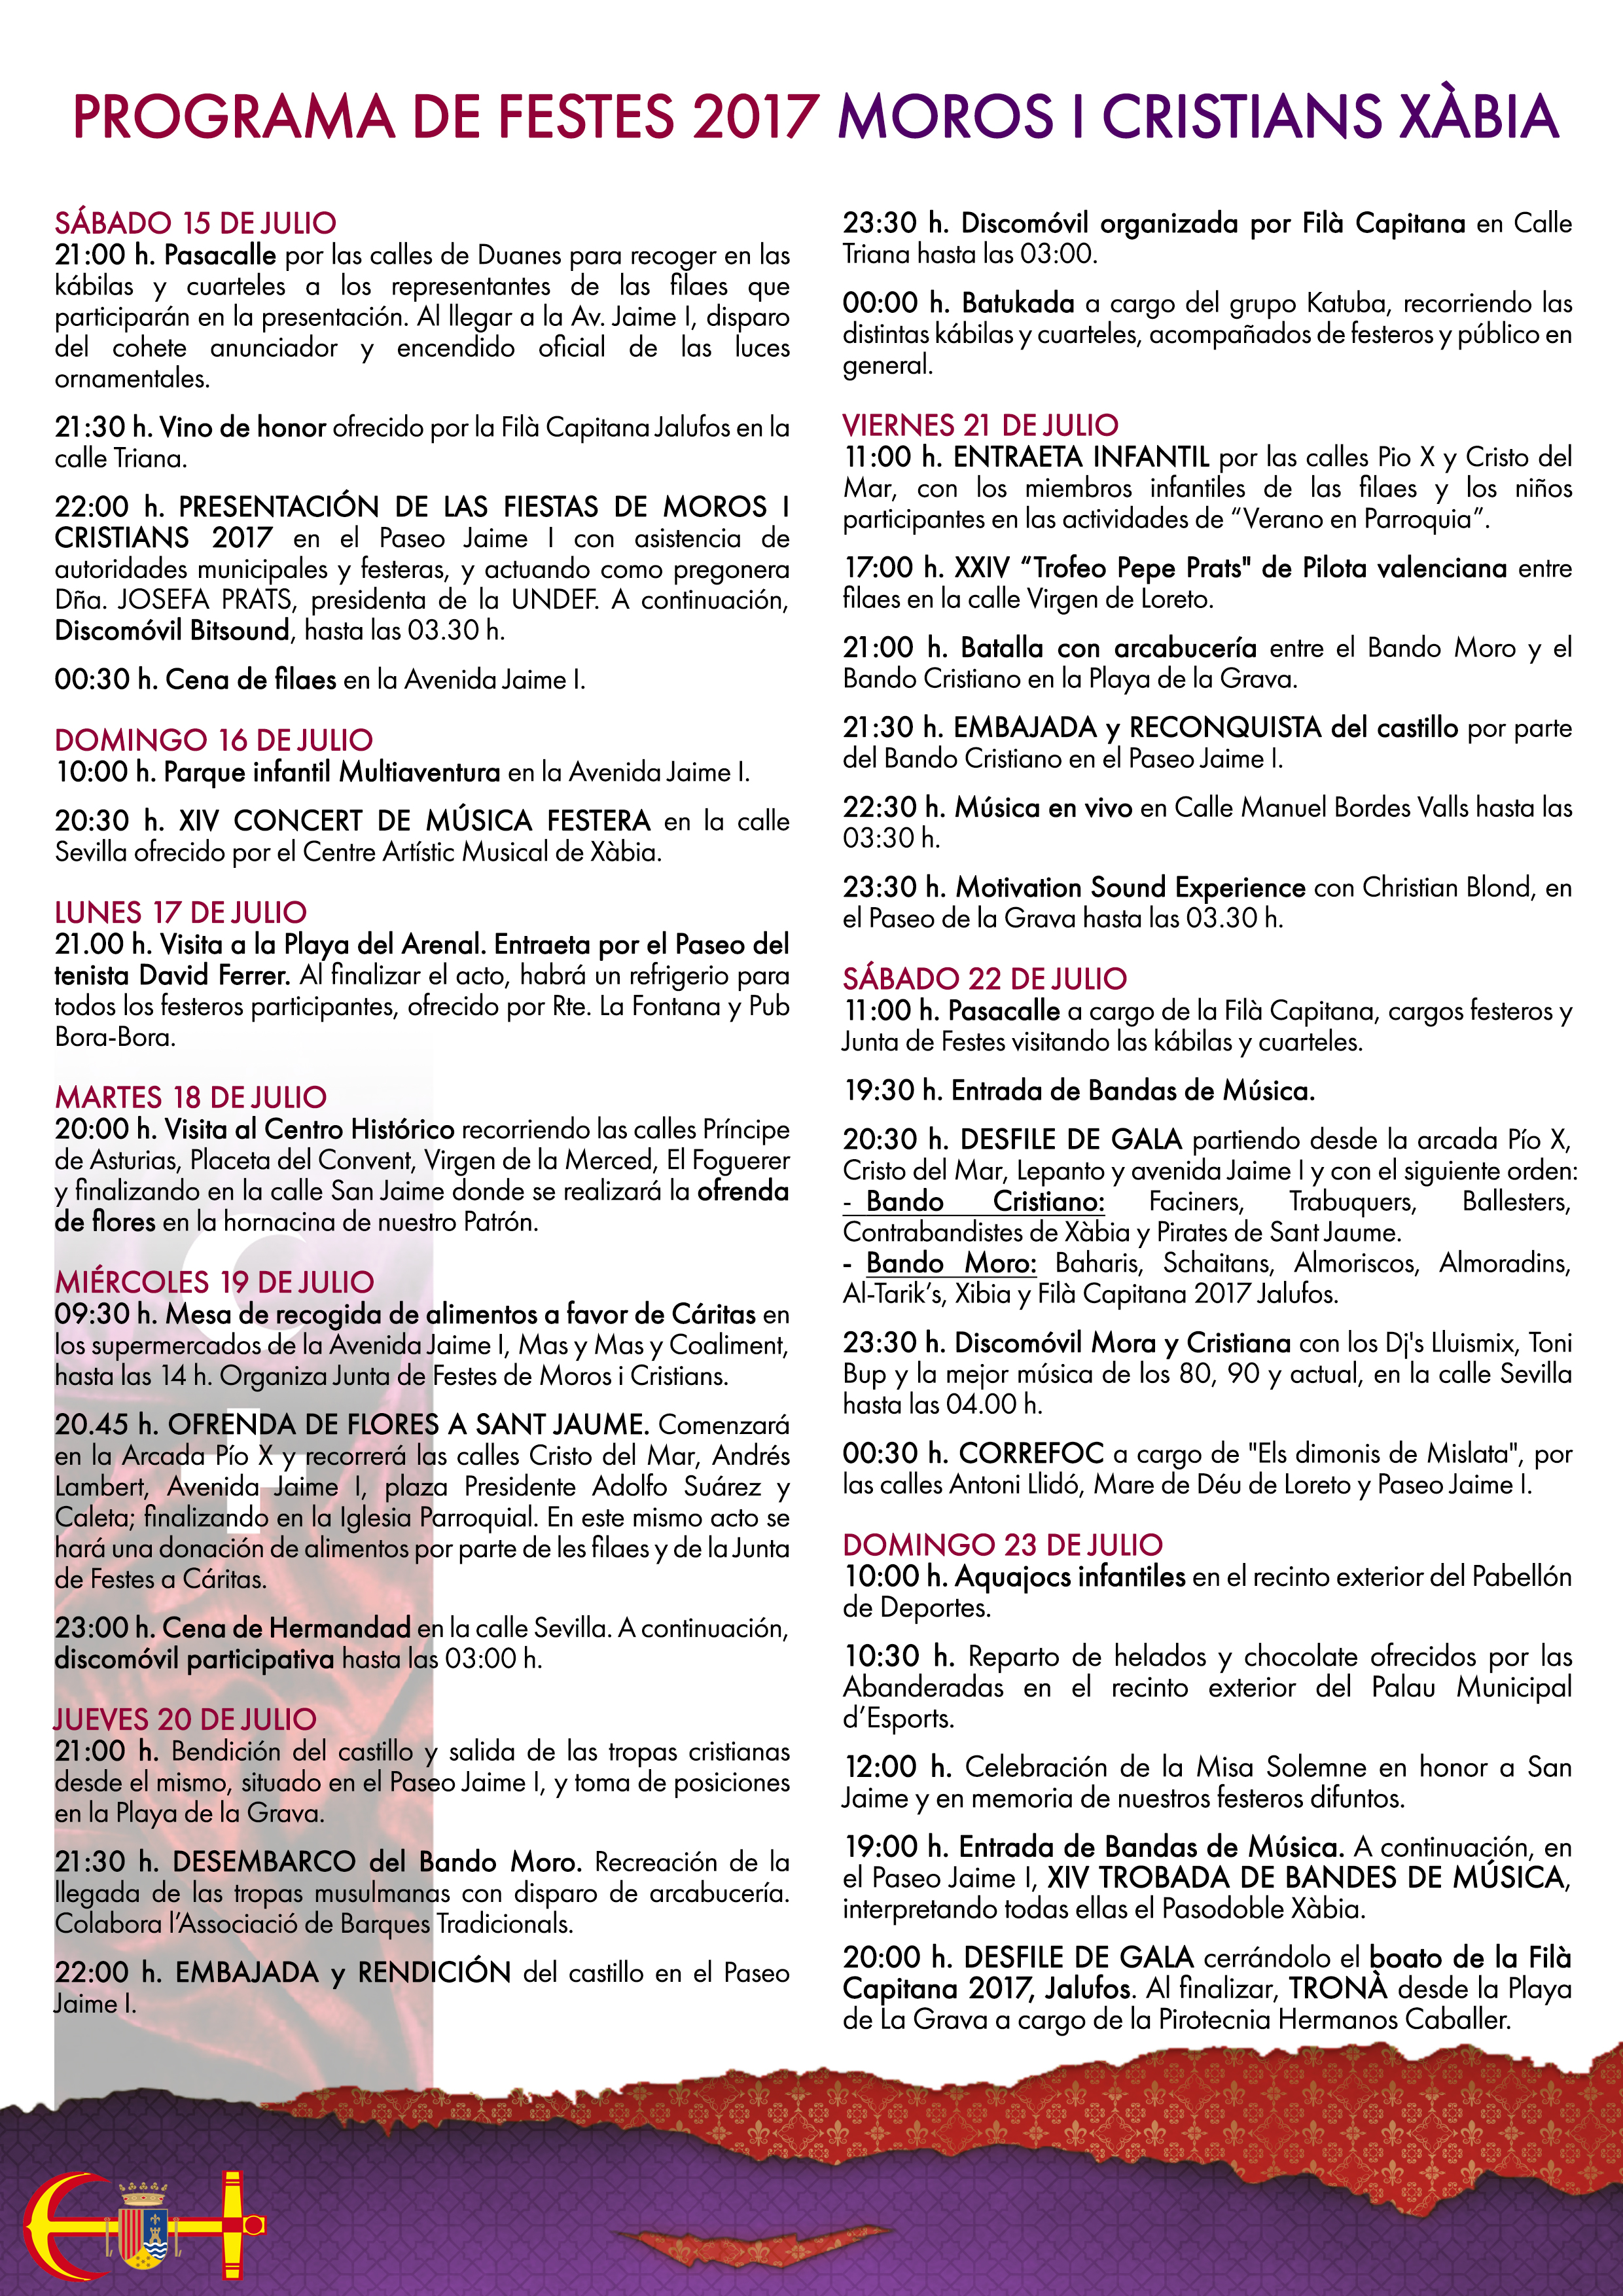 Programa Fiestas Moros i Cristians Xàbia 2017